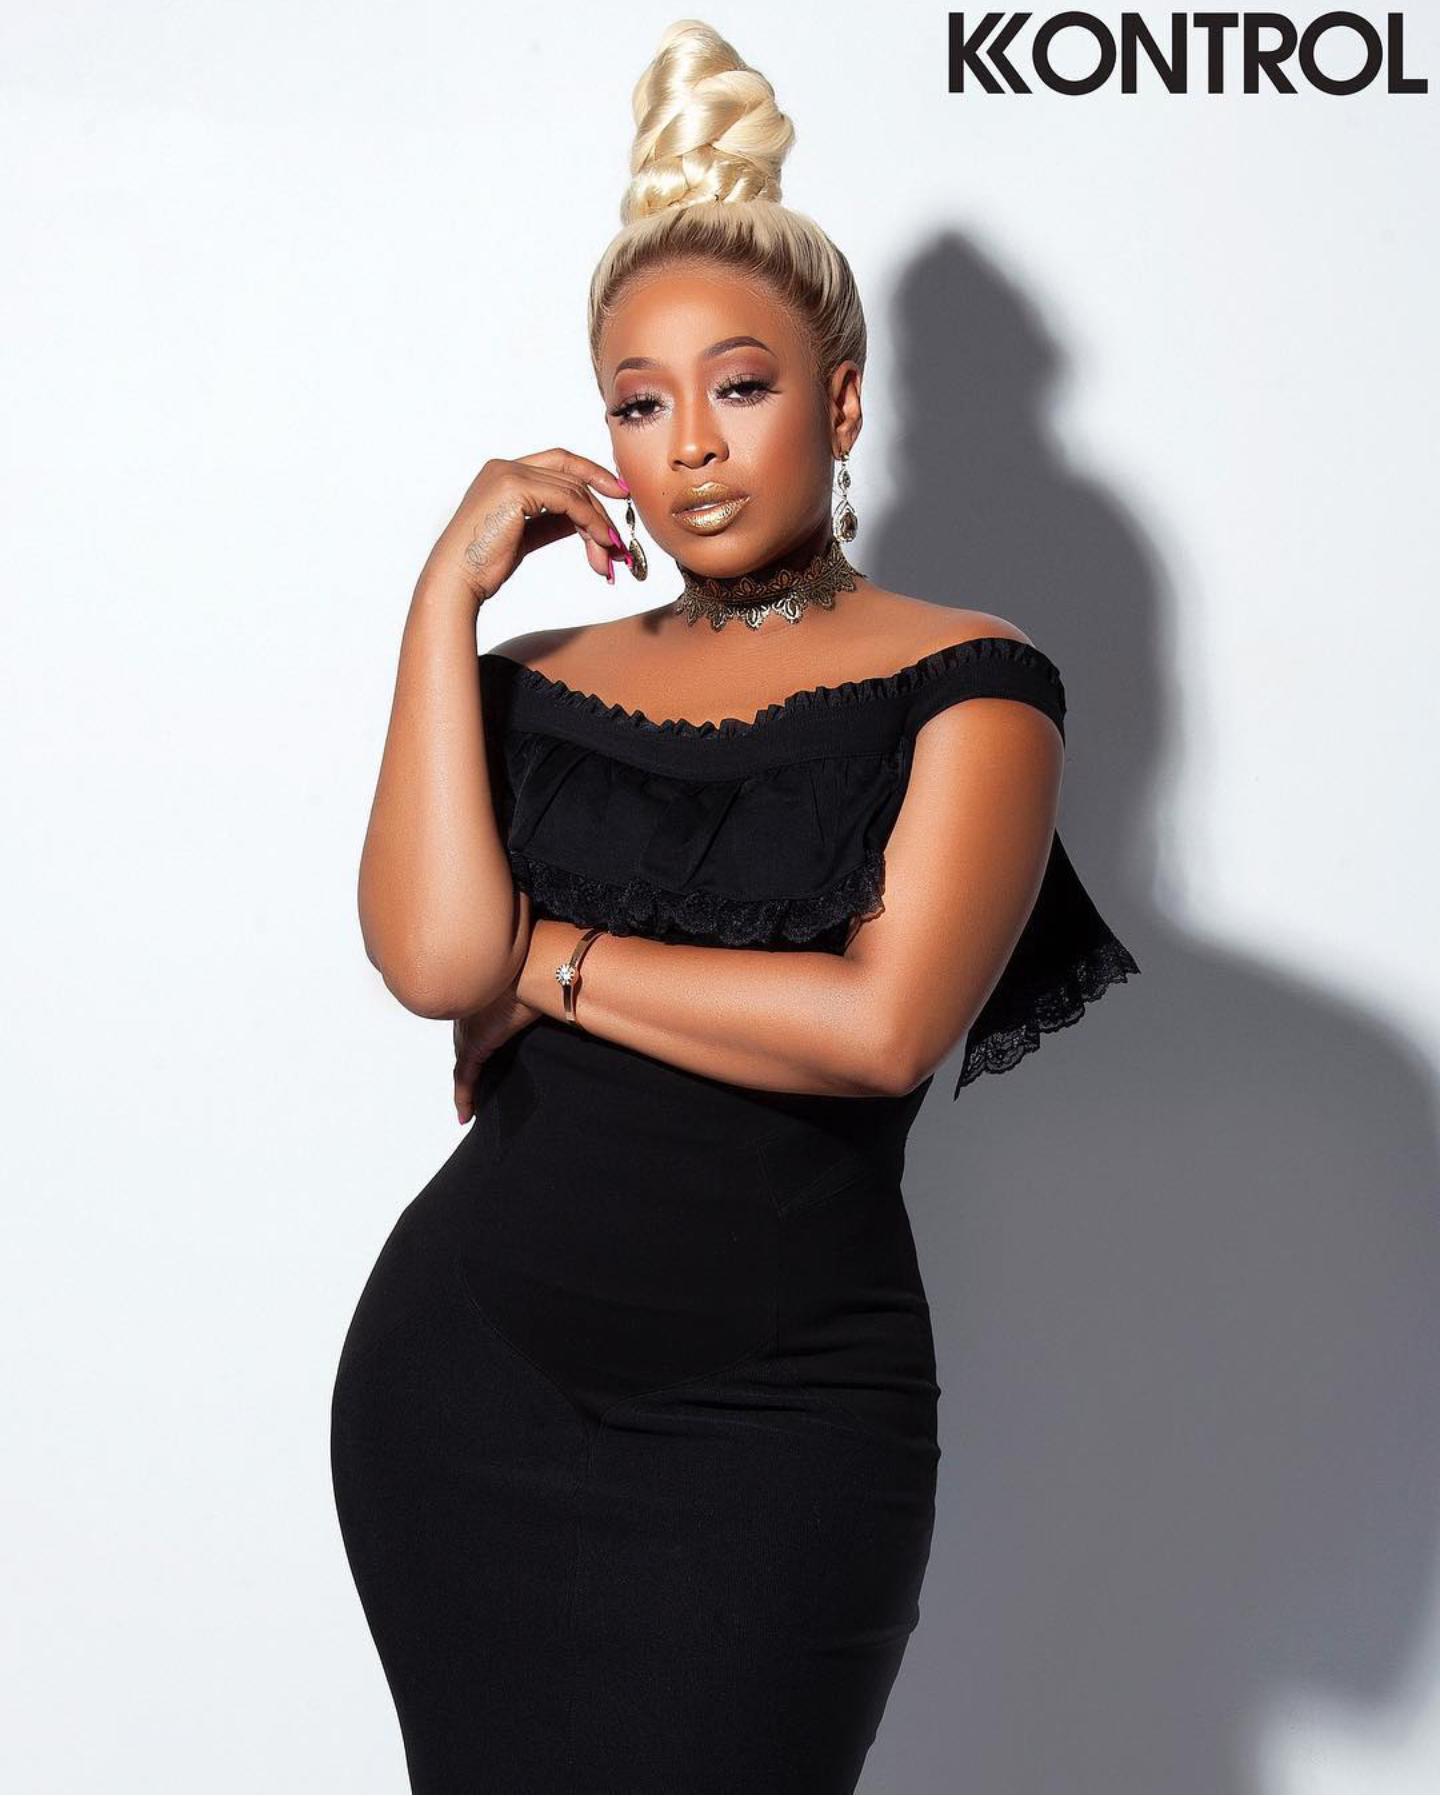 KONTROL MAGAZINE REBIRTH ISSUE 2018 TRINA BLACK DRESS.png